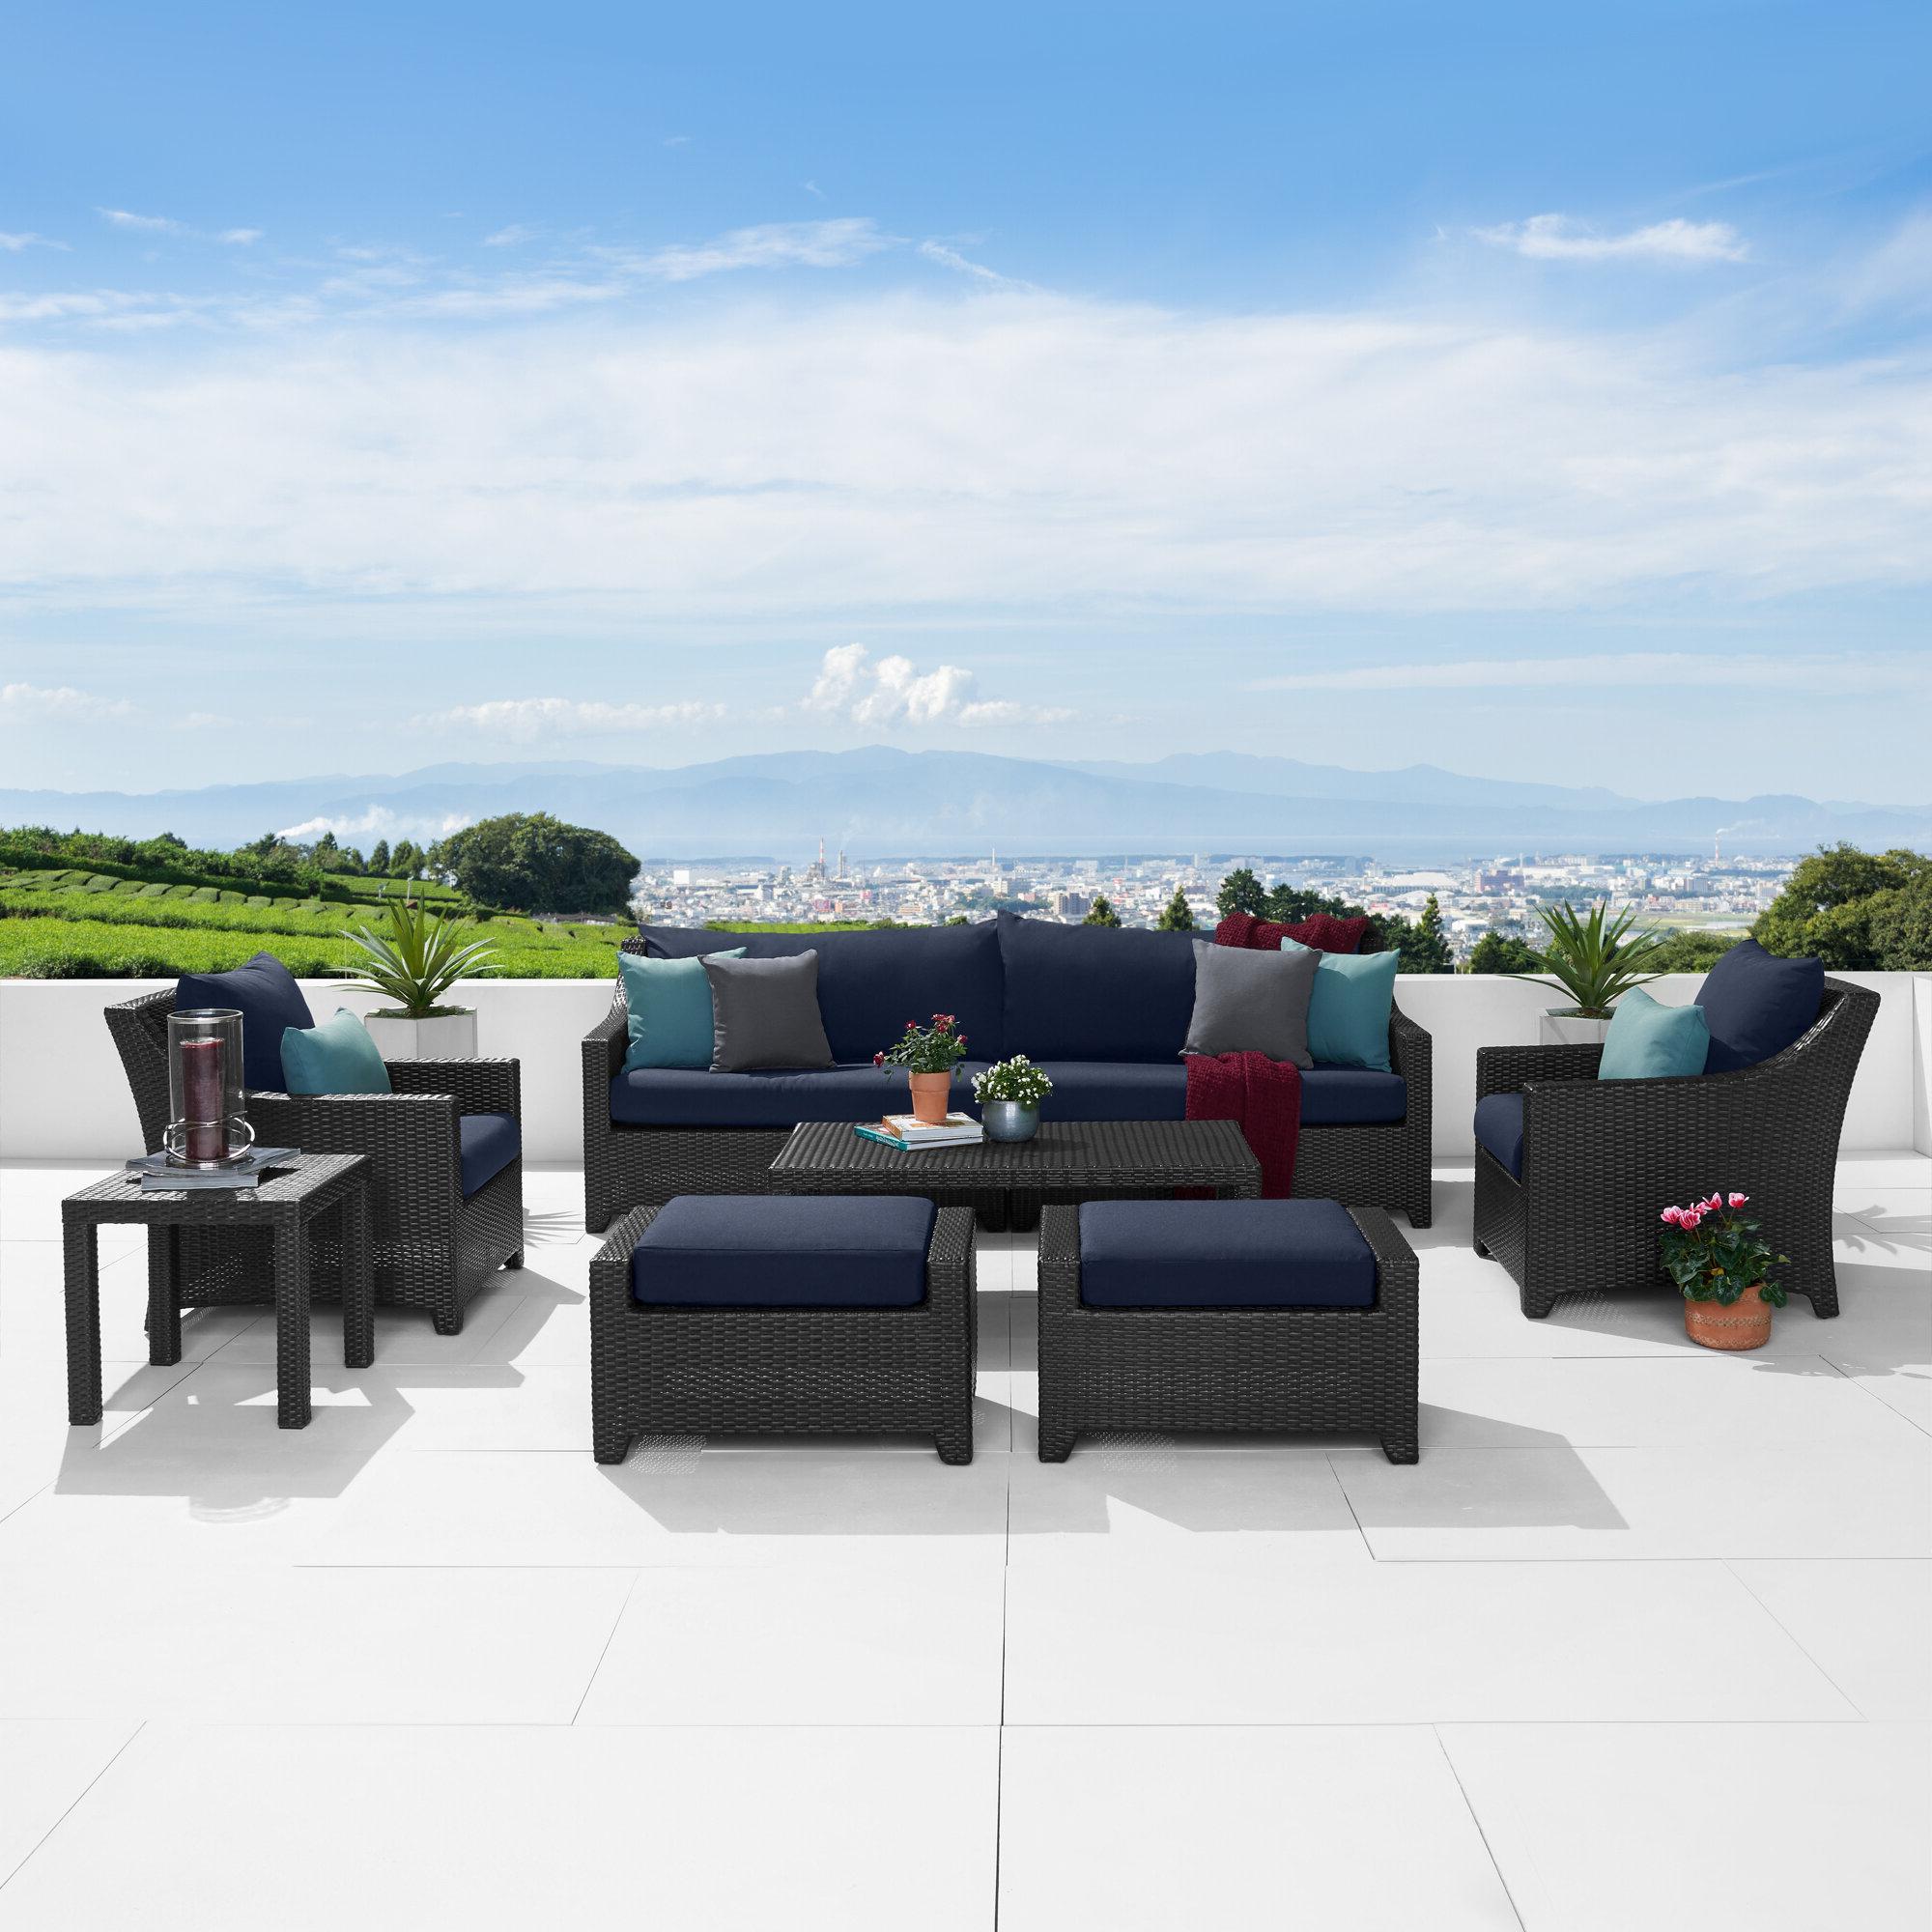 Fashionable Northridge 8 Piece Sofa Seating Group With Sunbrella Cushions With Regard To Northridge Patio Sofas With Sunbrella Cushions (View 3 of 20)